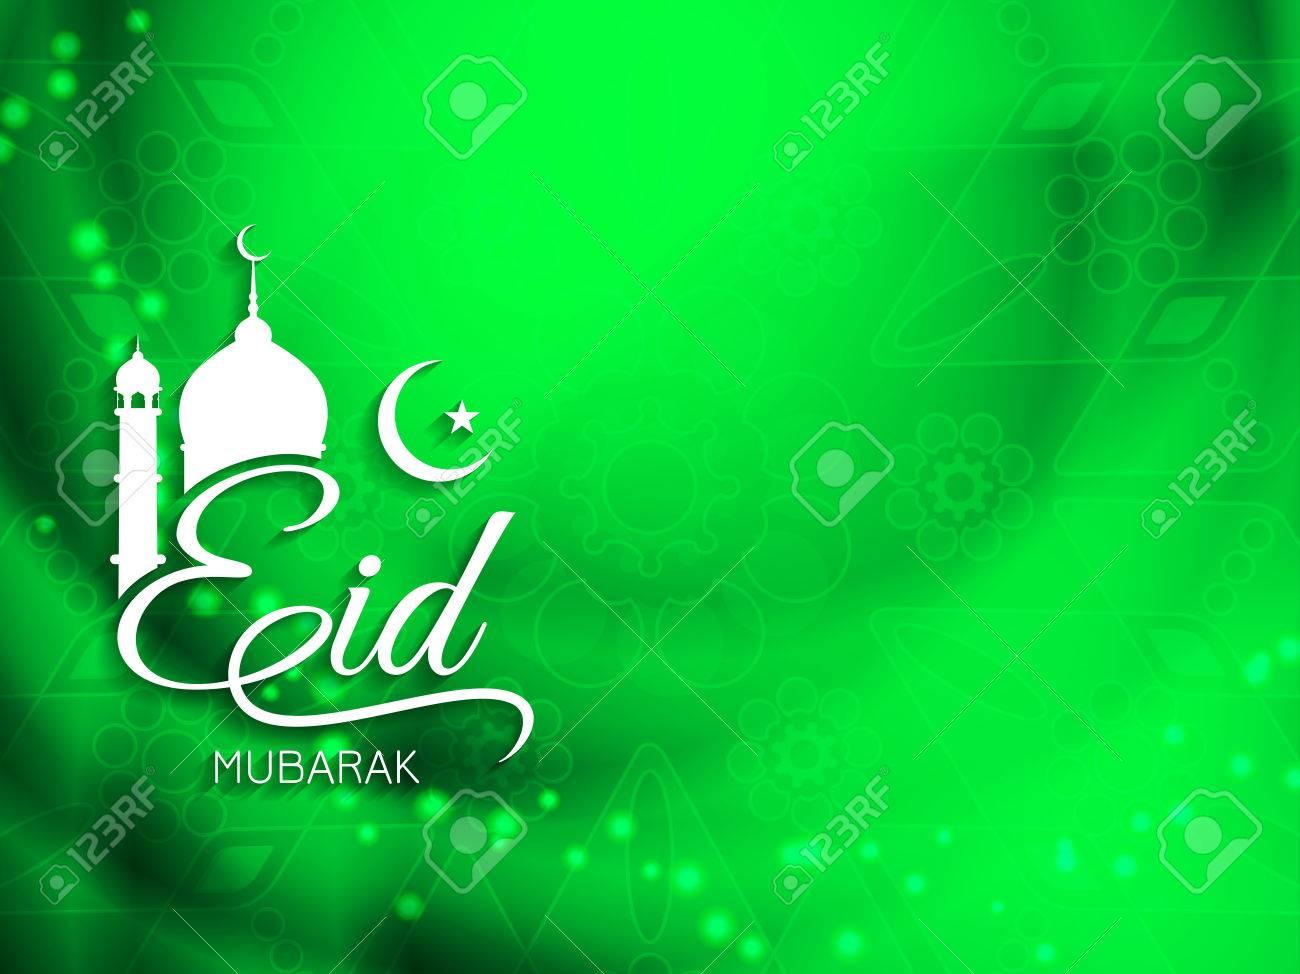 Shiny green color Eid Mubarak religious background design